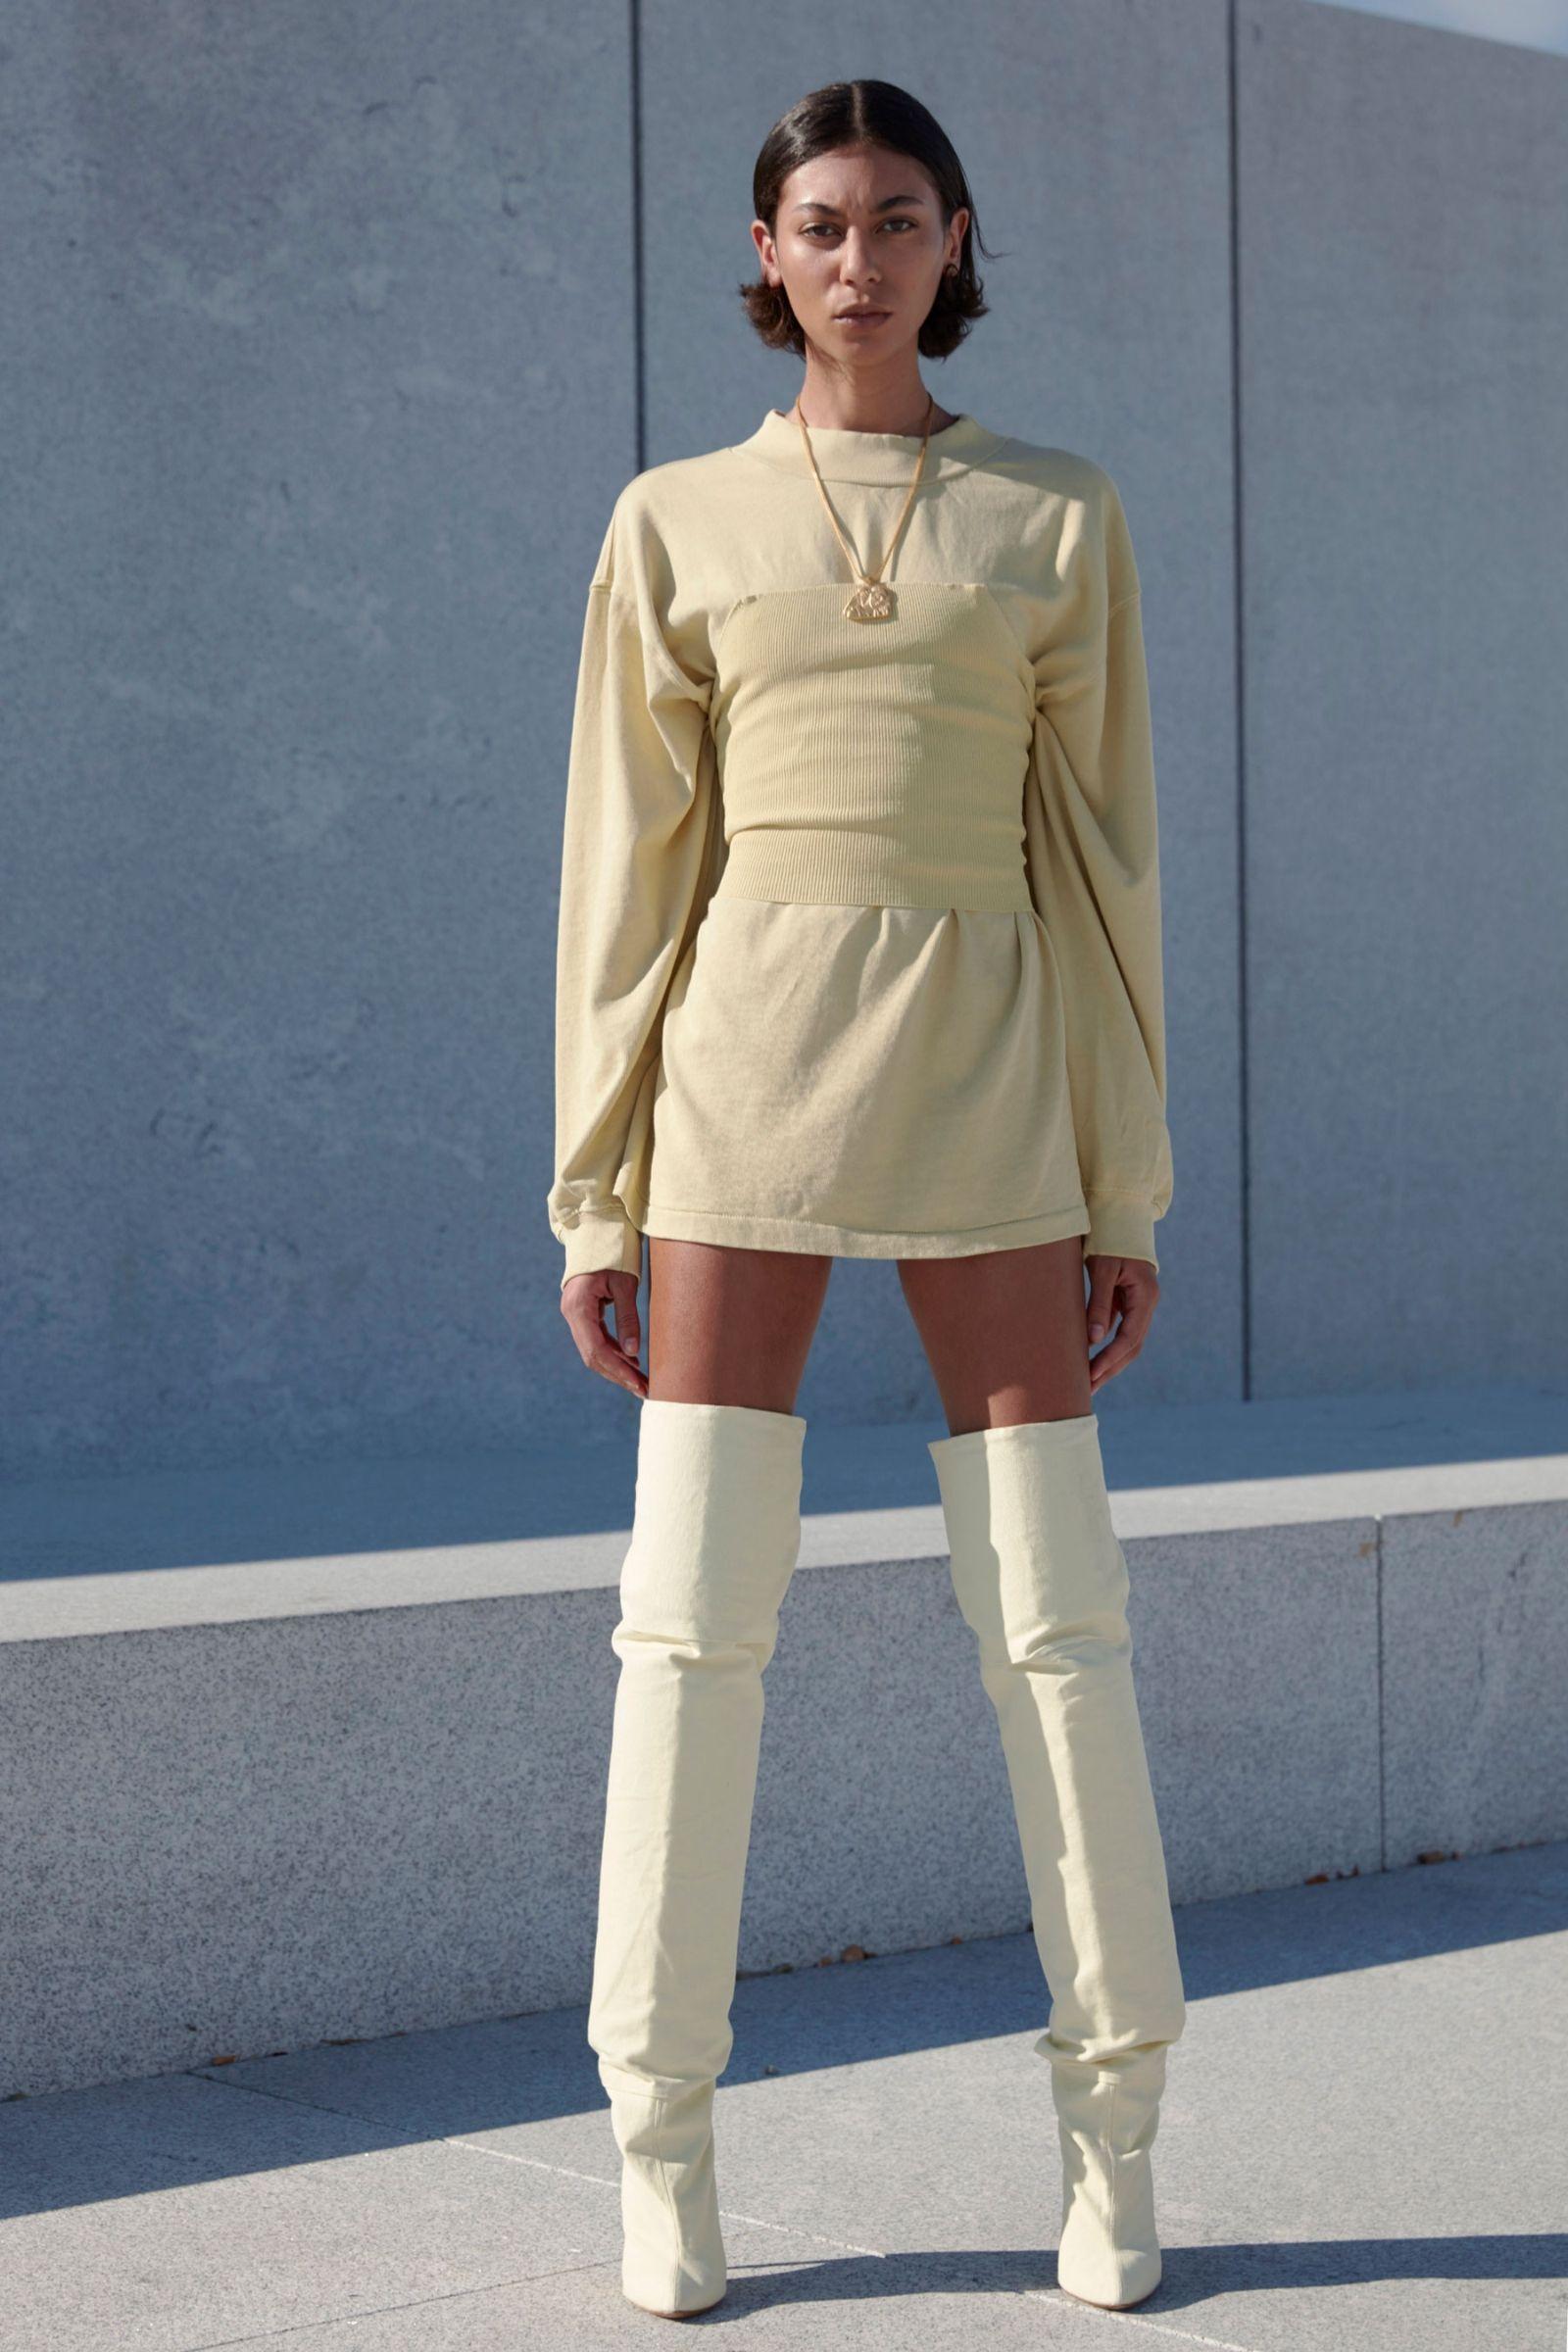 Enjoy Every Look From Kanye S Yeezy Season 4 Fashion Show Fashion Yeezy Season 4 Ready To Wear